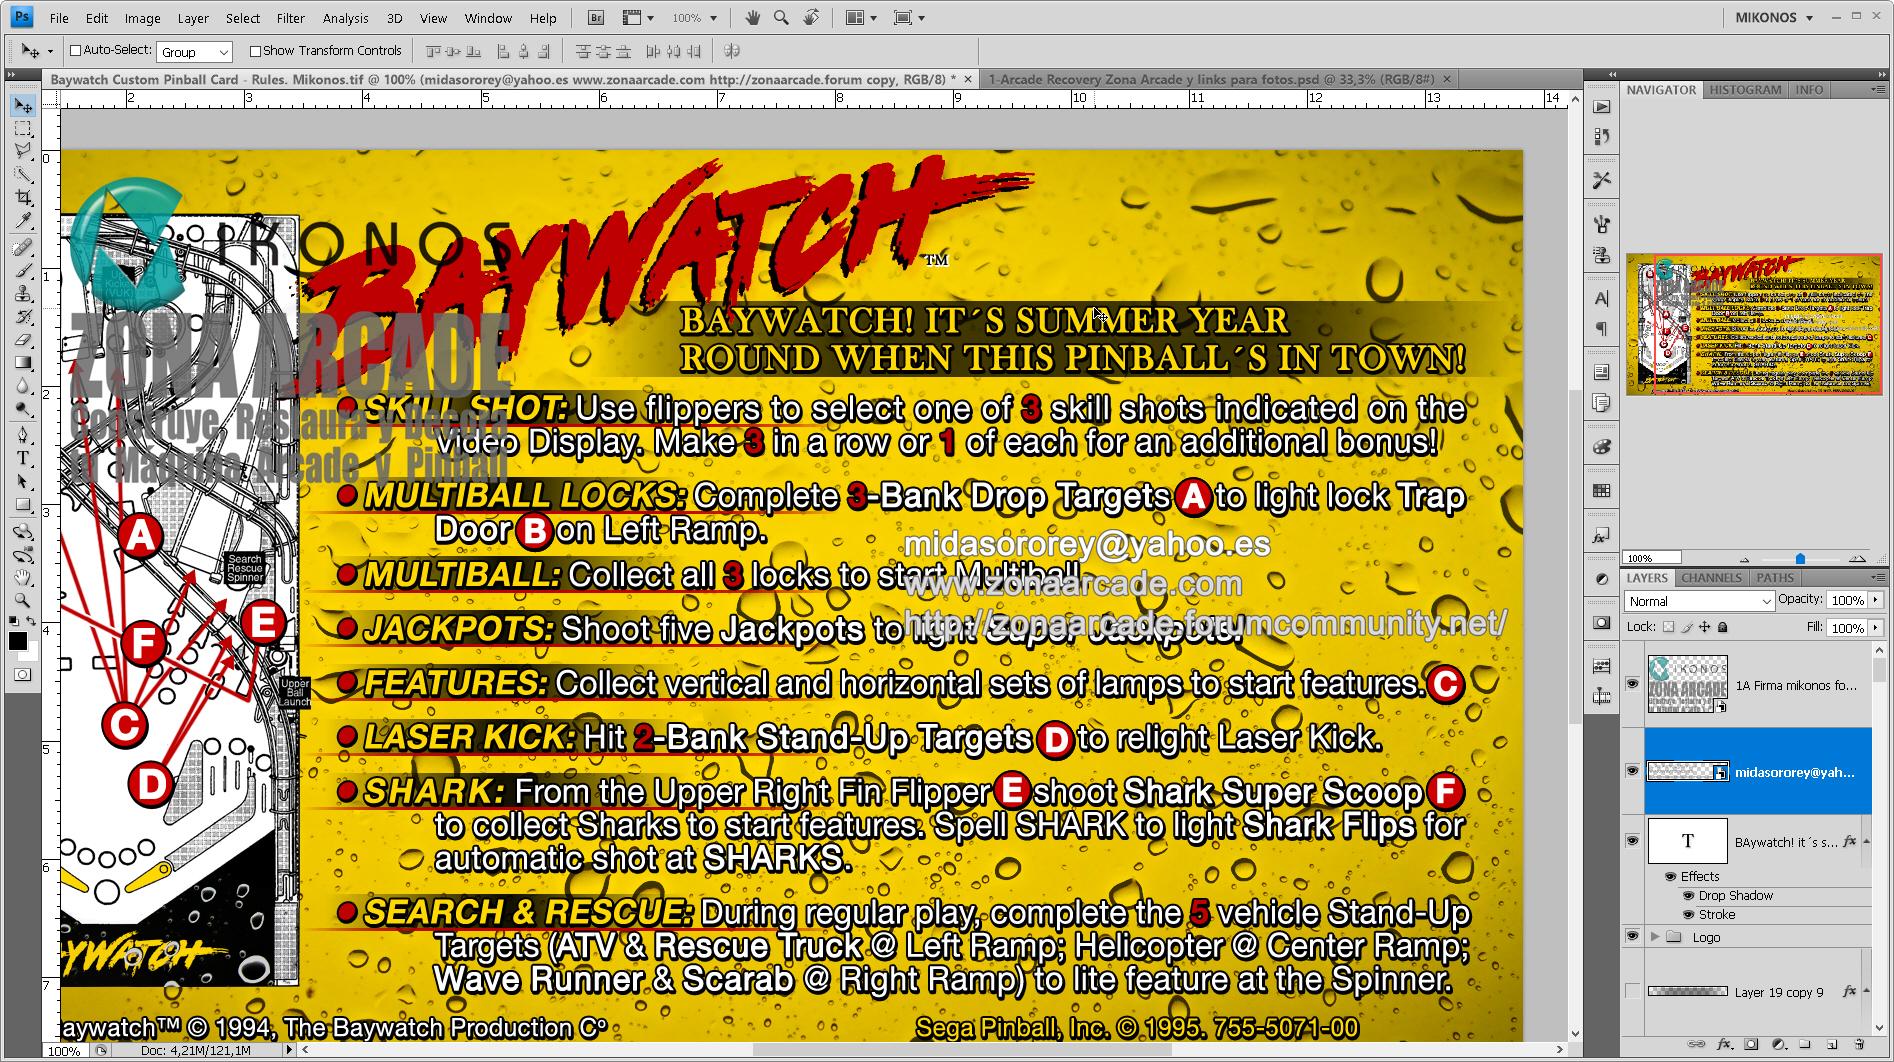 Baywatch Pinball Card Customized - Rules. Mikonos2